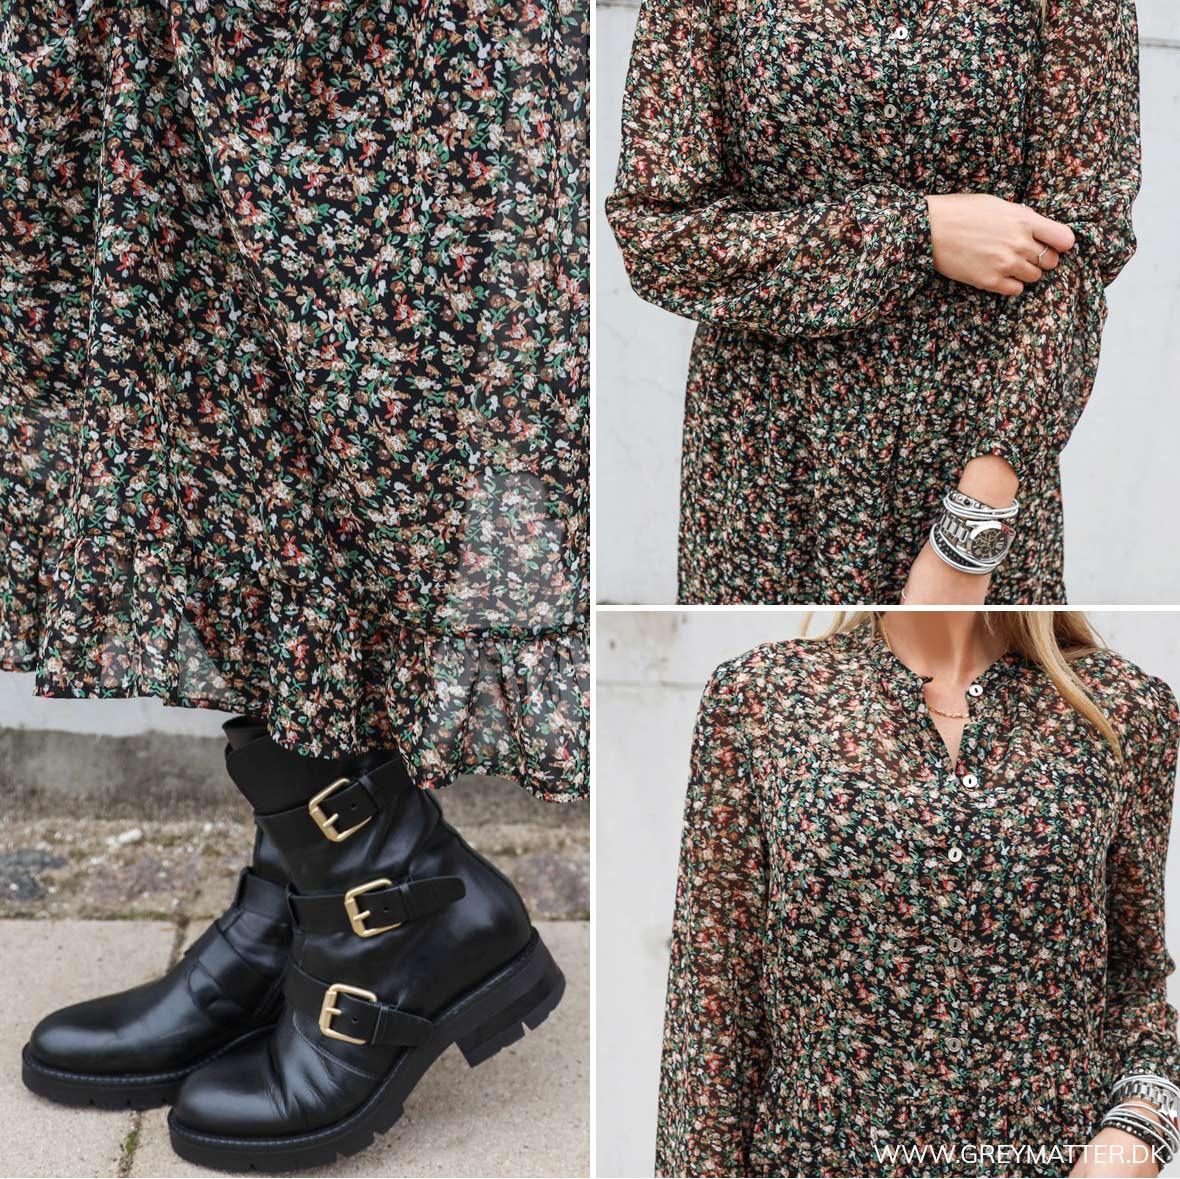 vila_kjoler_greymatter_fashion.jpg